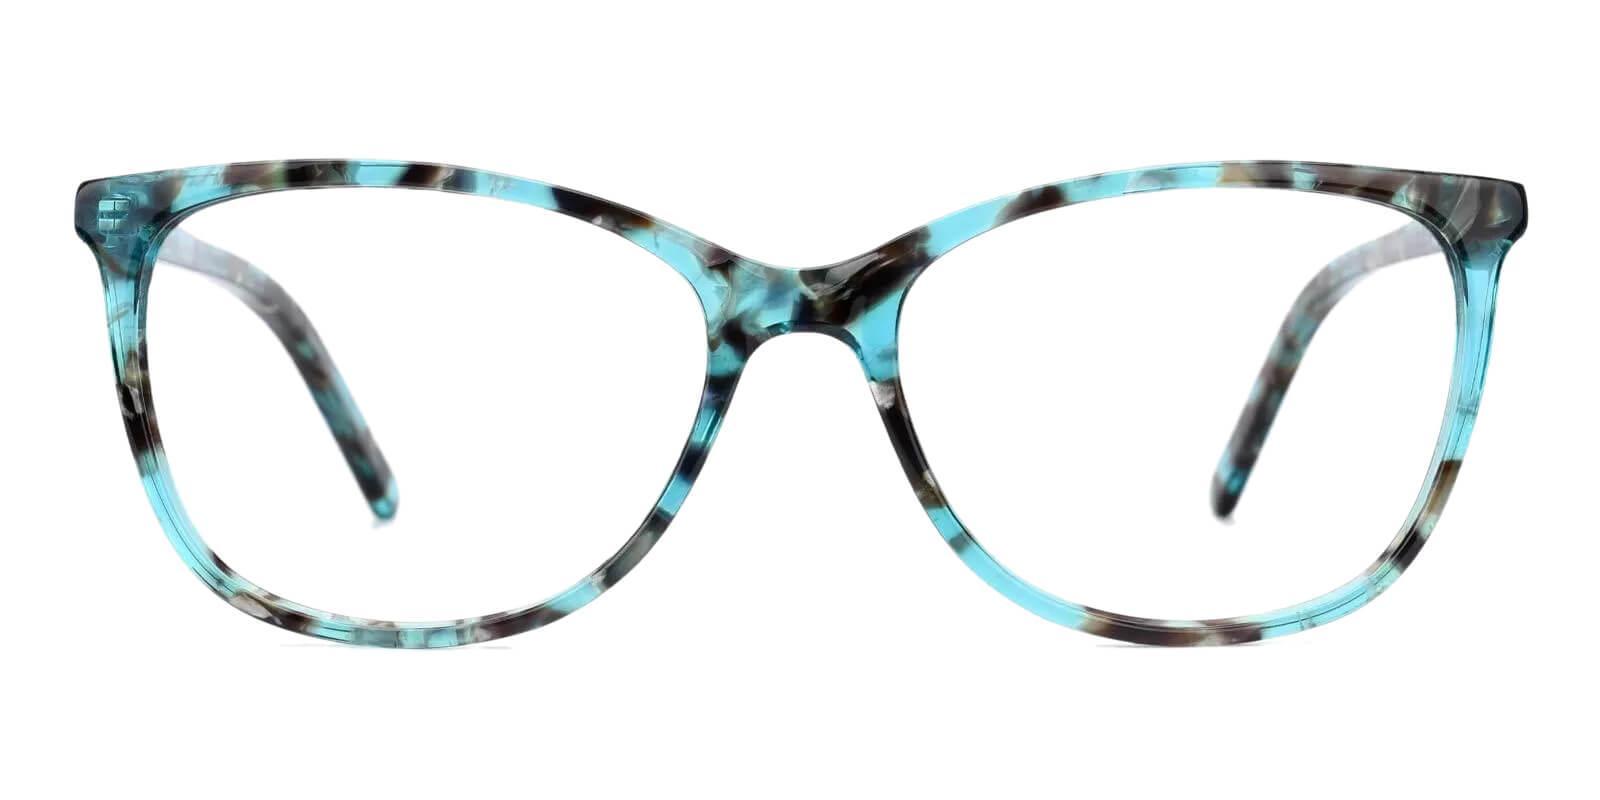 Viola Green Acetate Eyeglasses , Fashion , SpringHinges , UniversalBridgeFit Frames from ABBE Glasses